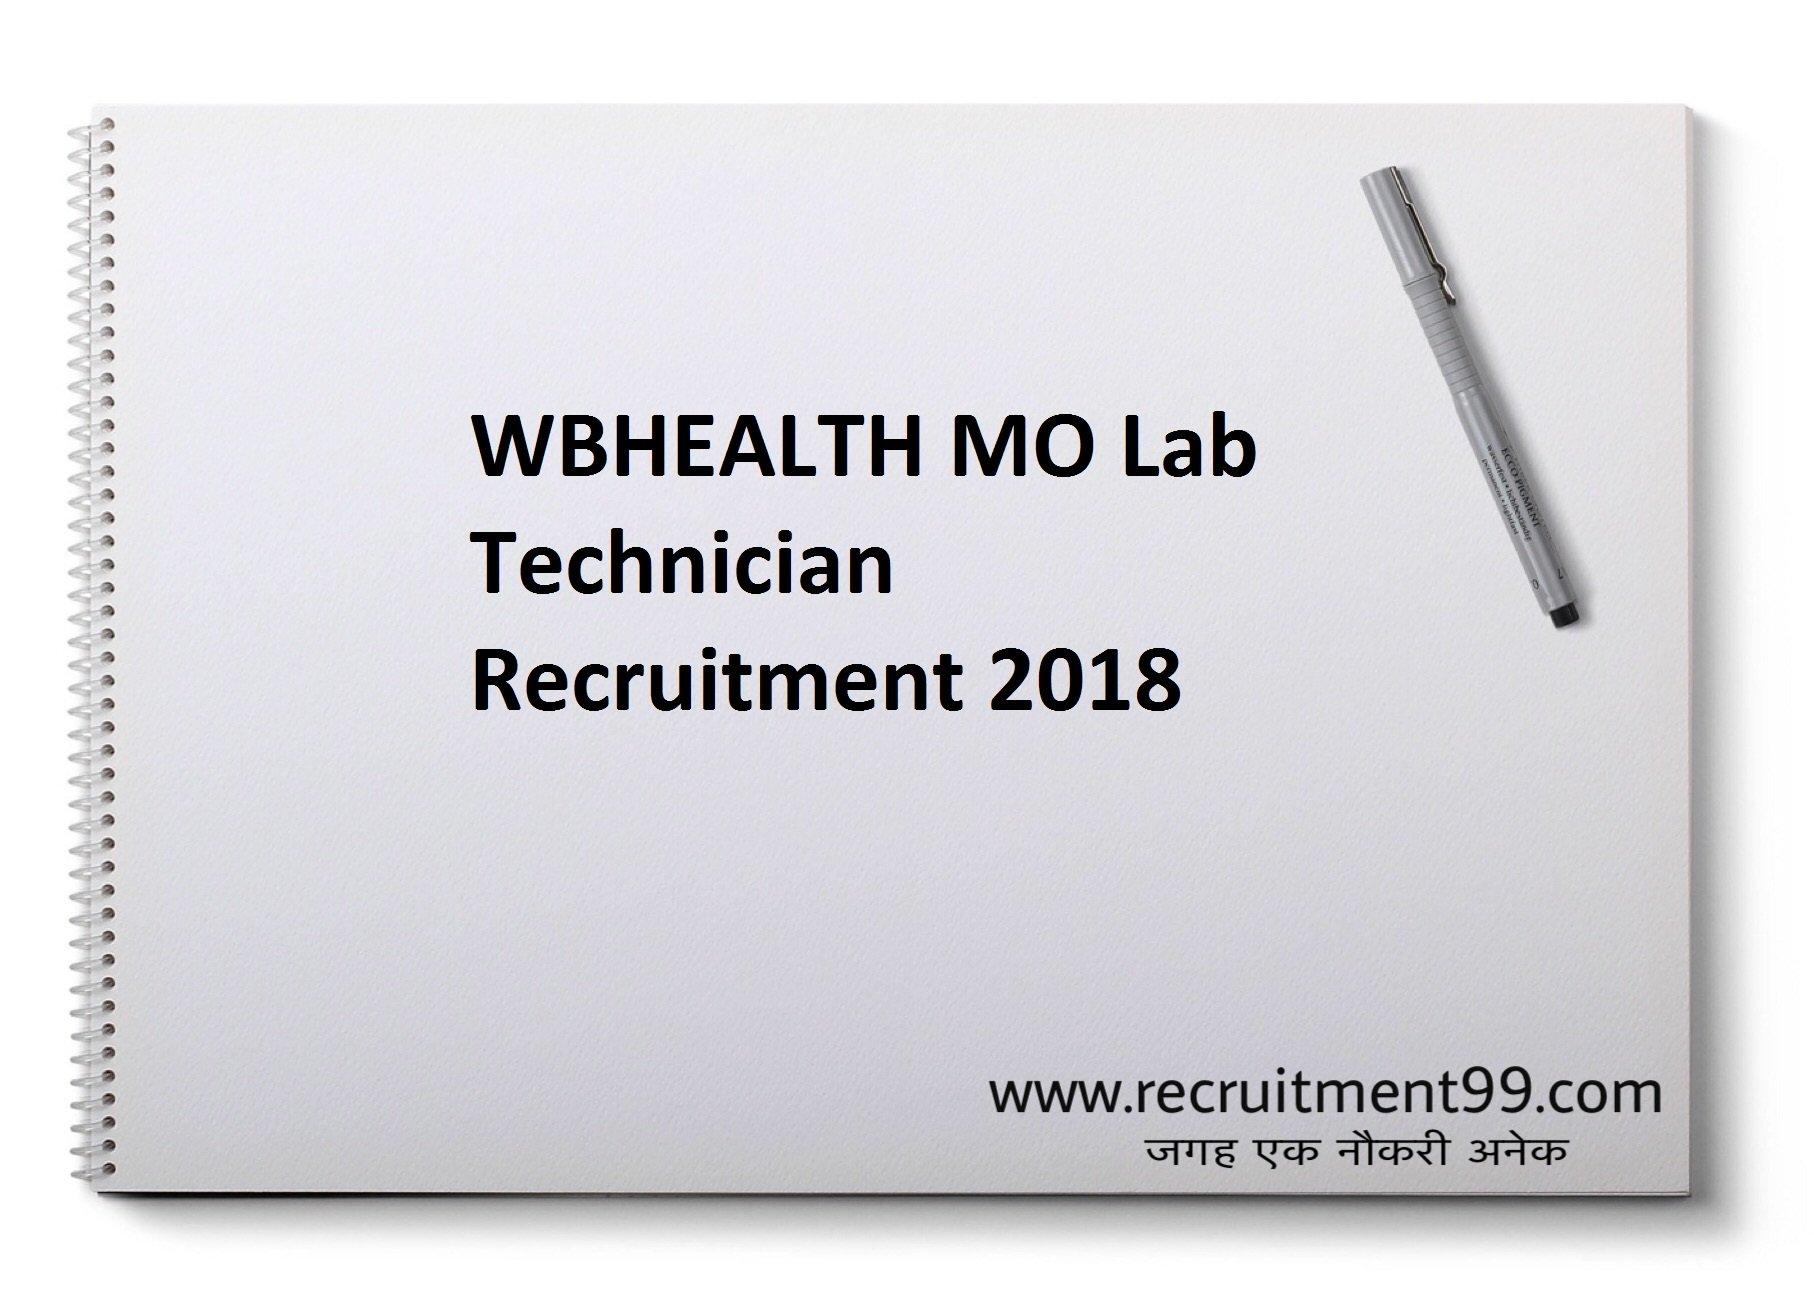 WBHEALTH MO Lab Technician Recruitment Admit Card Result 2018